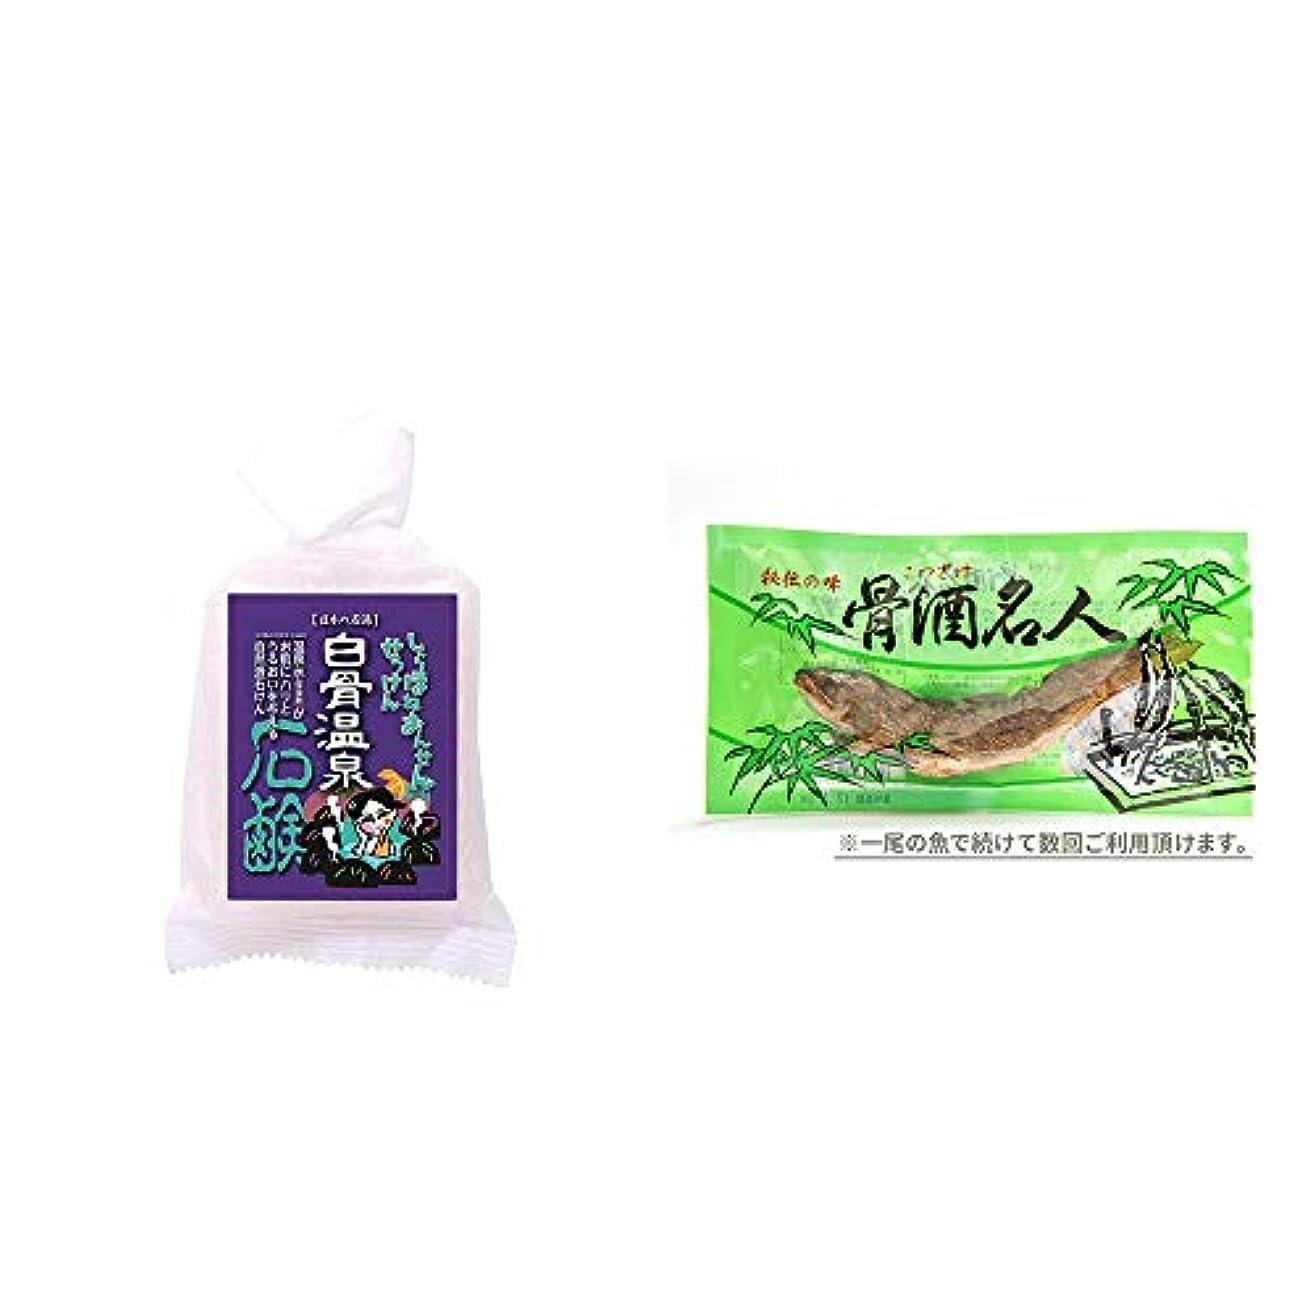 [2点セット] 信州 白骨温泉石鹸(80g)?骨酒名人(一尾)